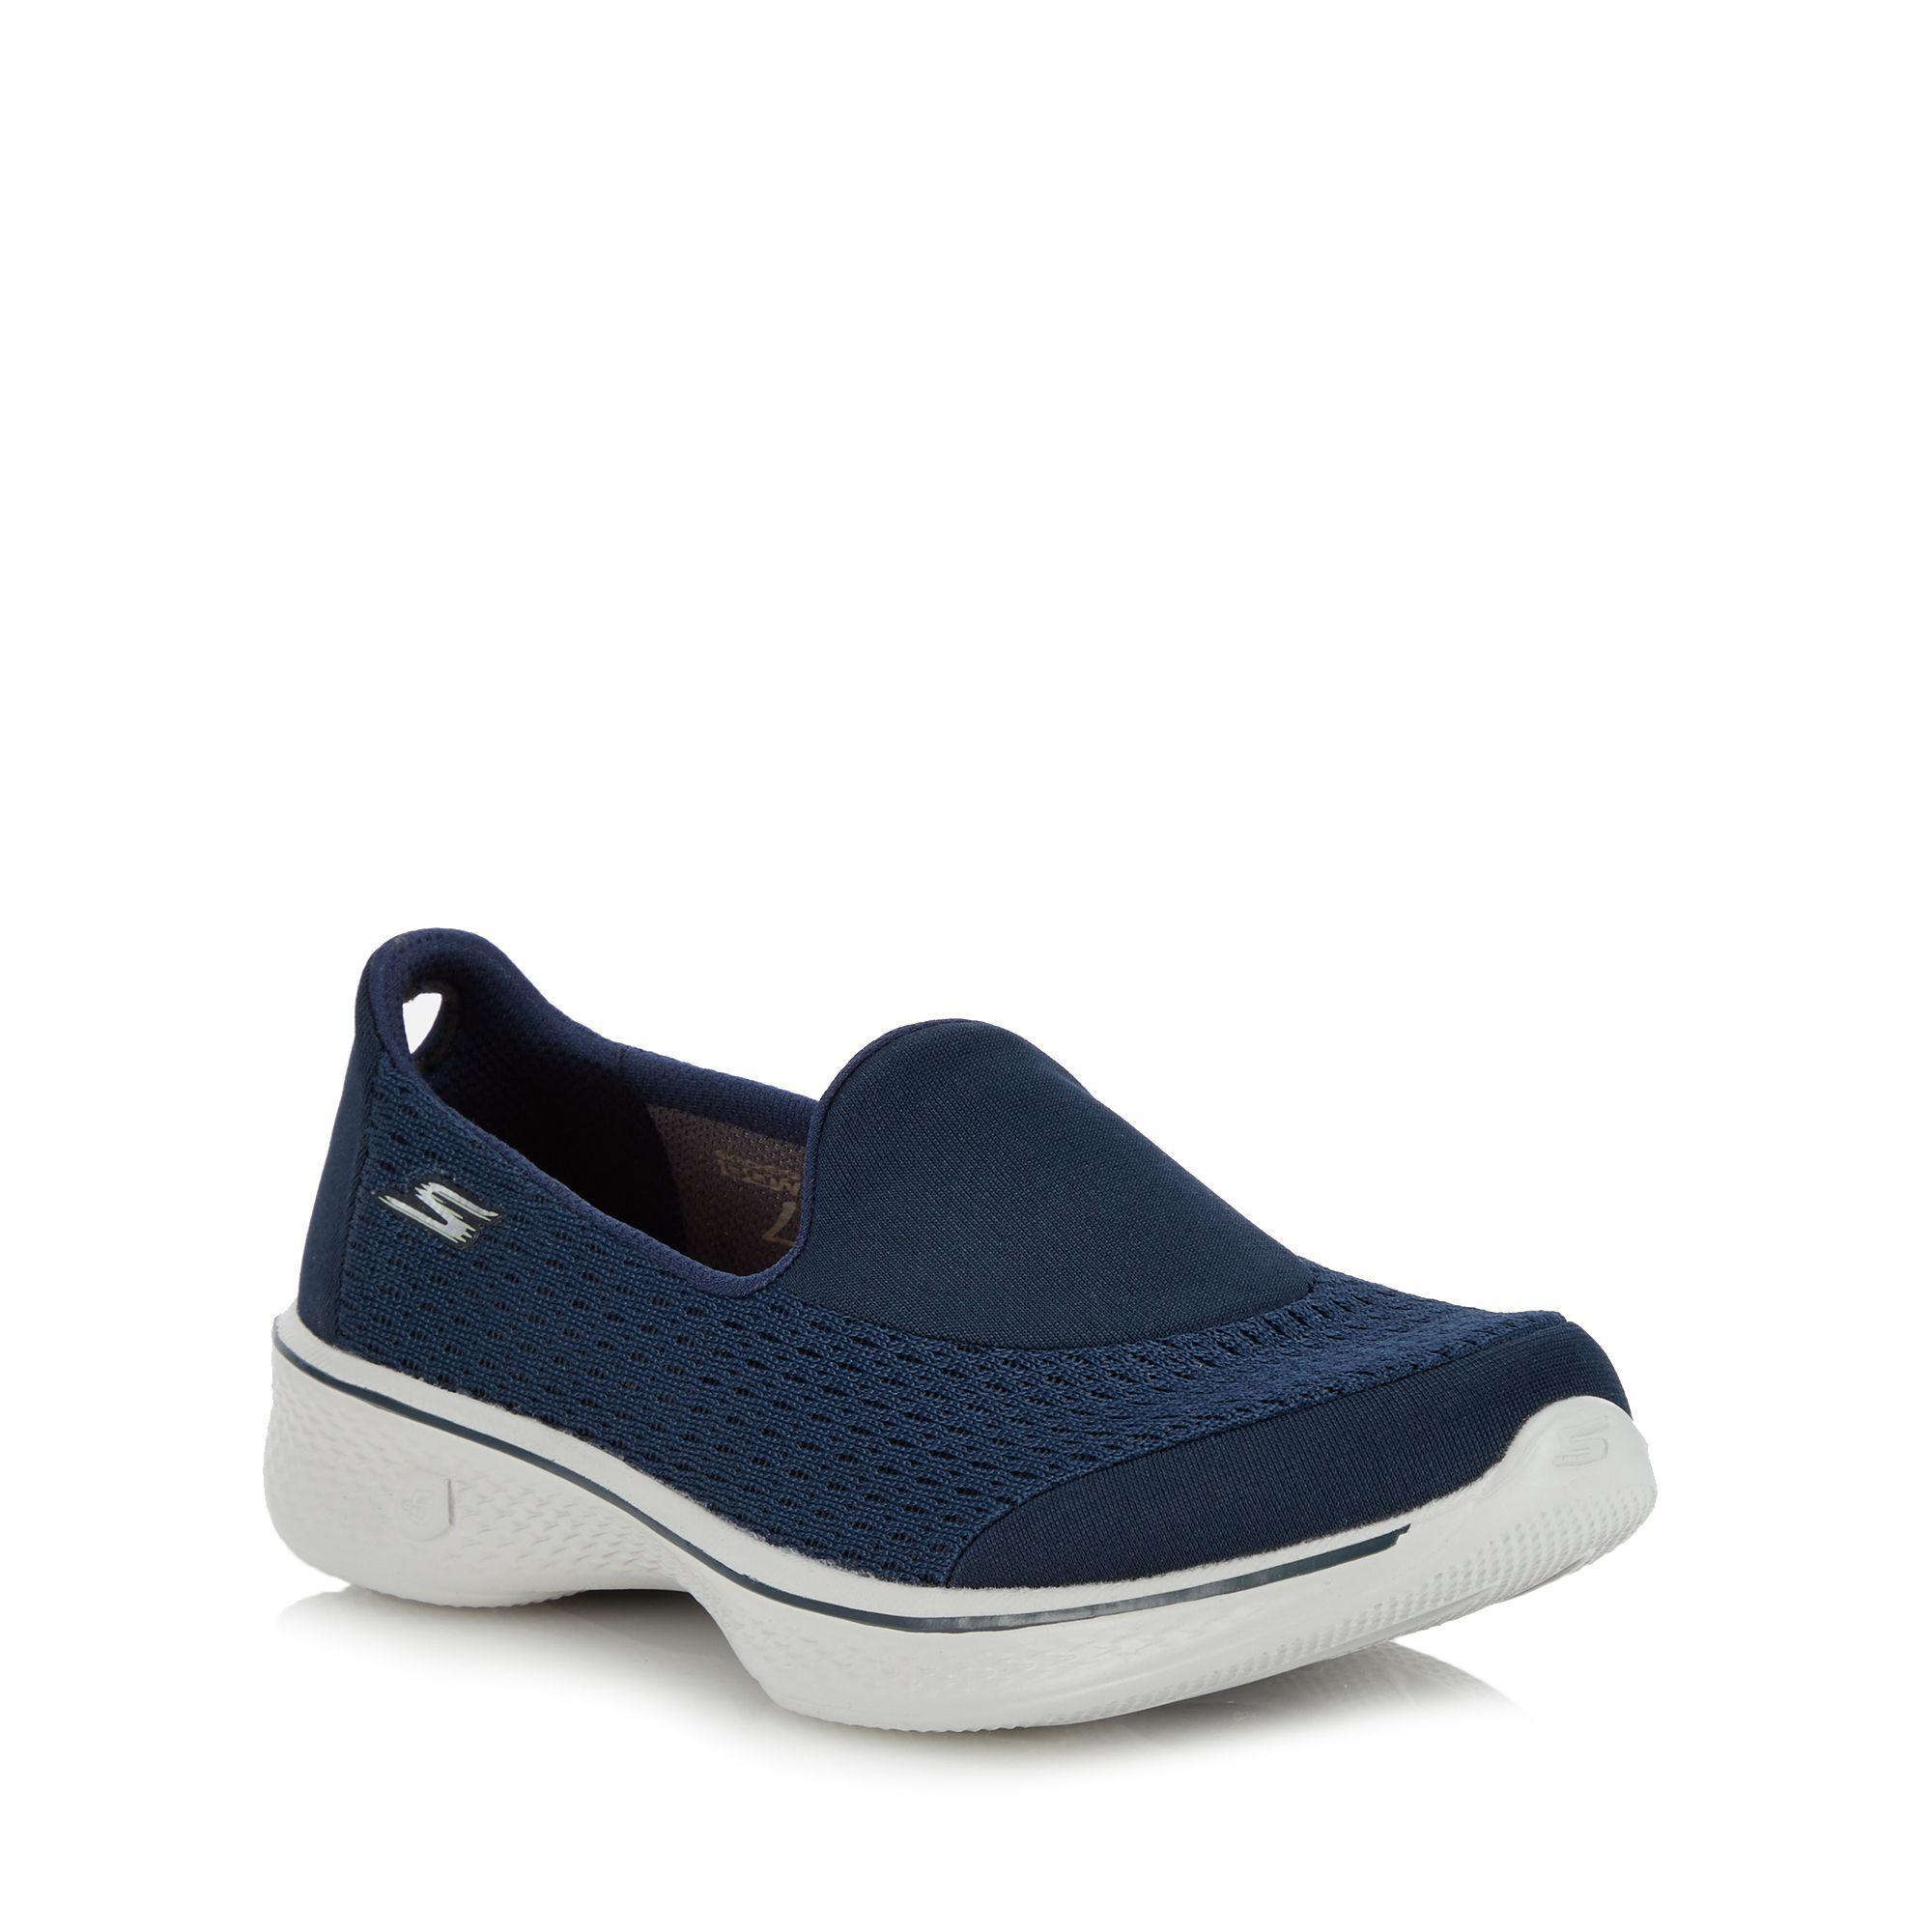 Skechers Navy 'go Walk 4 Pursuit' Slip on Trainers in Blue